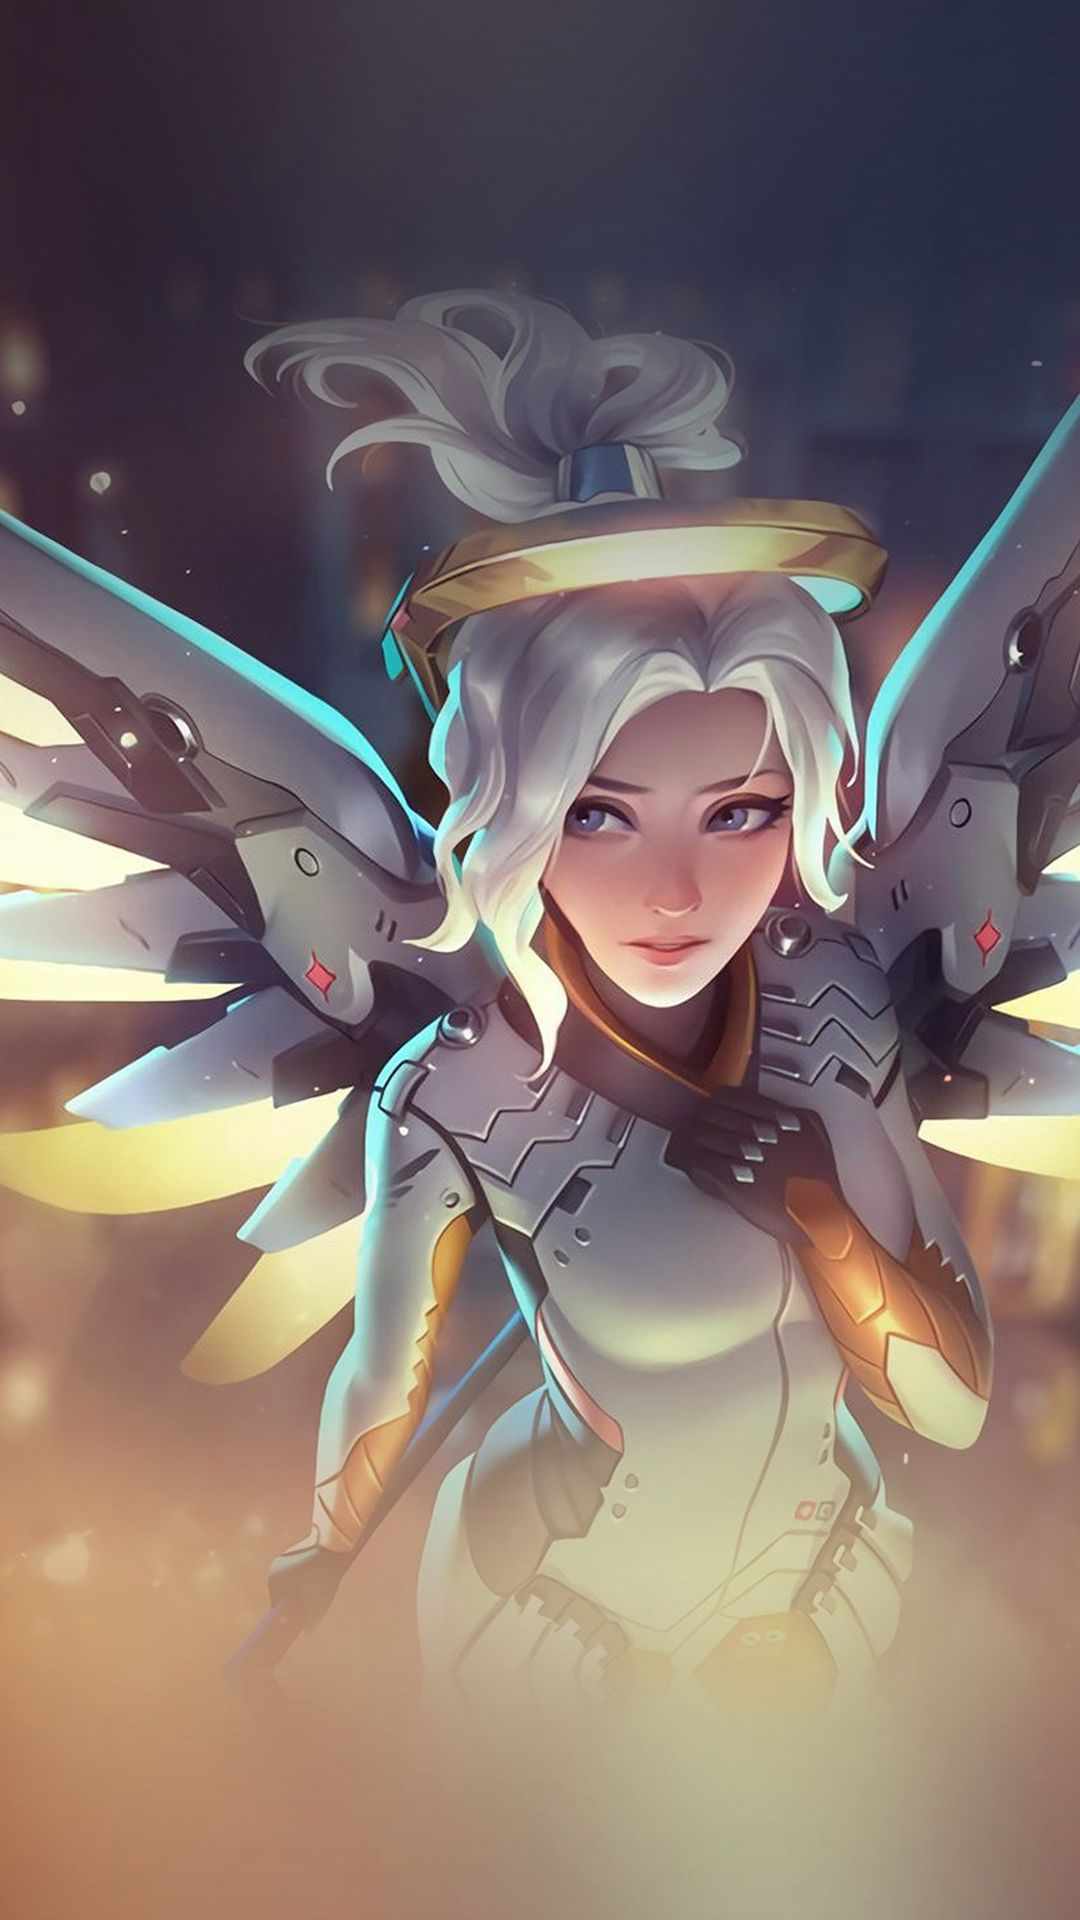 Mercy Overwatch Angel Healer Game Art Illustration Iphone 6 Plus Wallpaper Overwatch Angel Overwatch Wallpapers Overwatch Fan Art